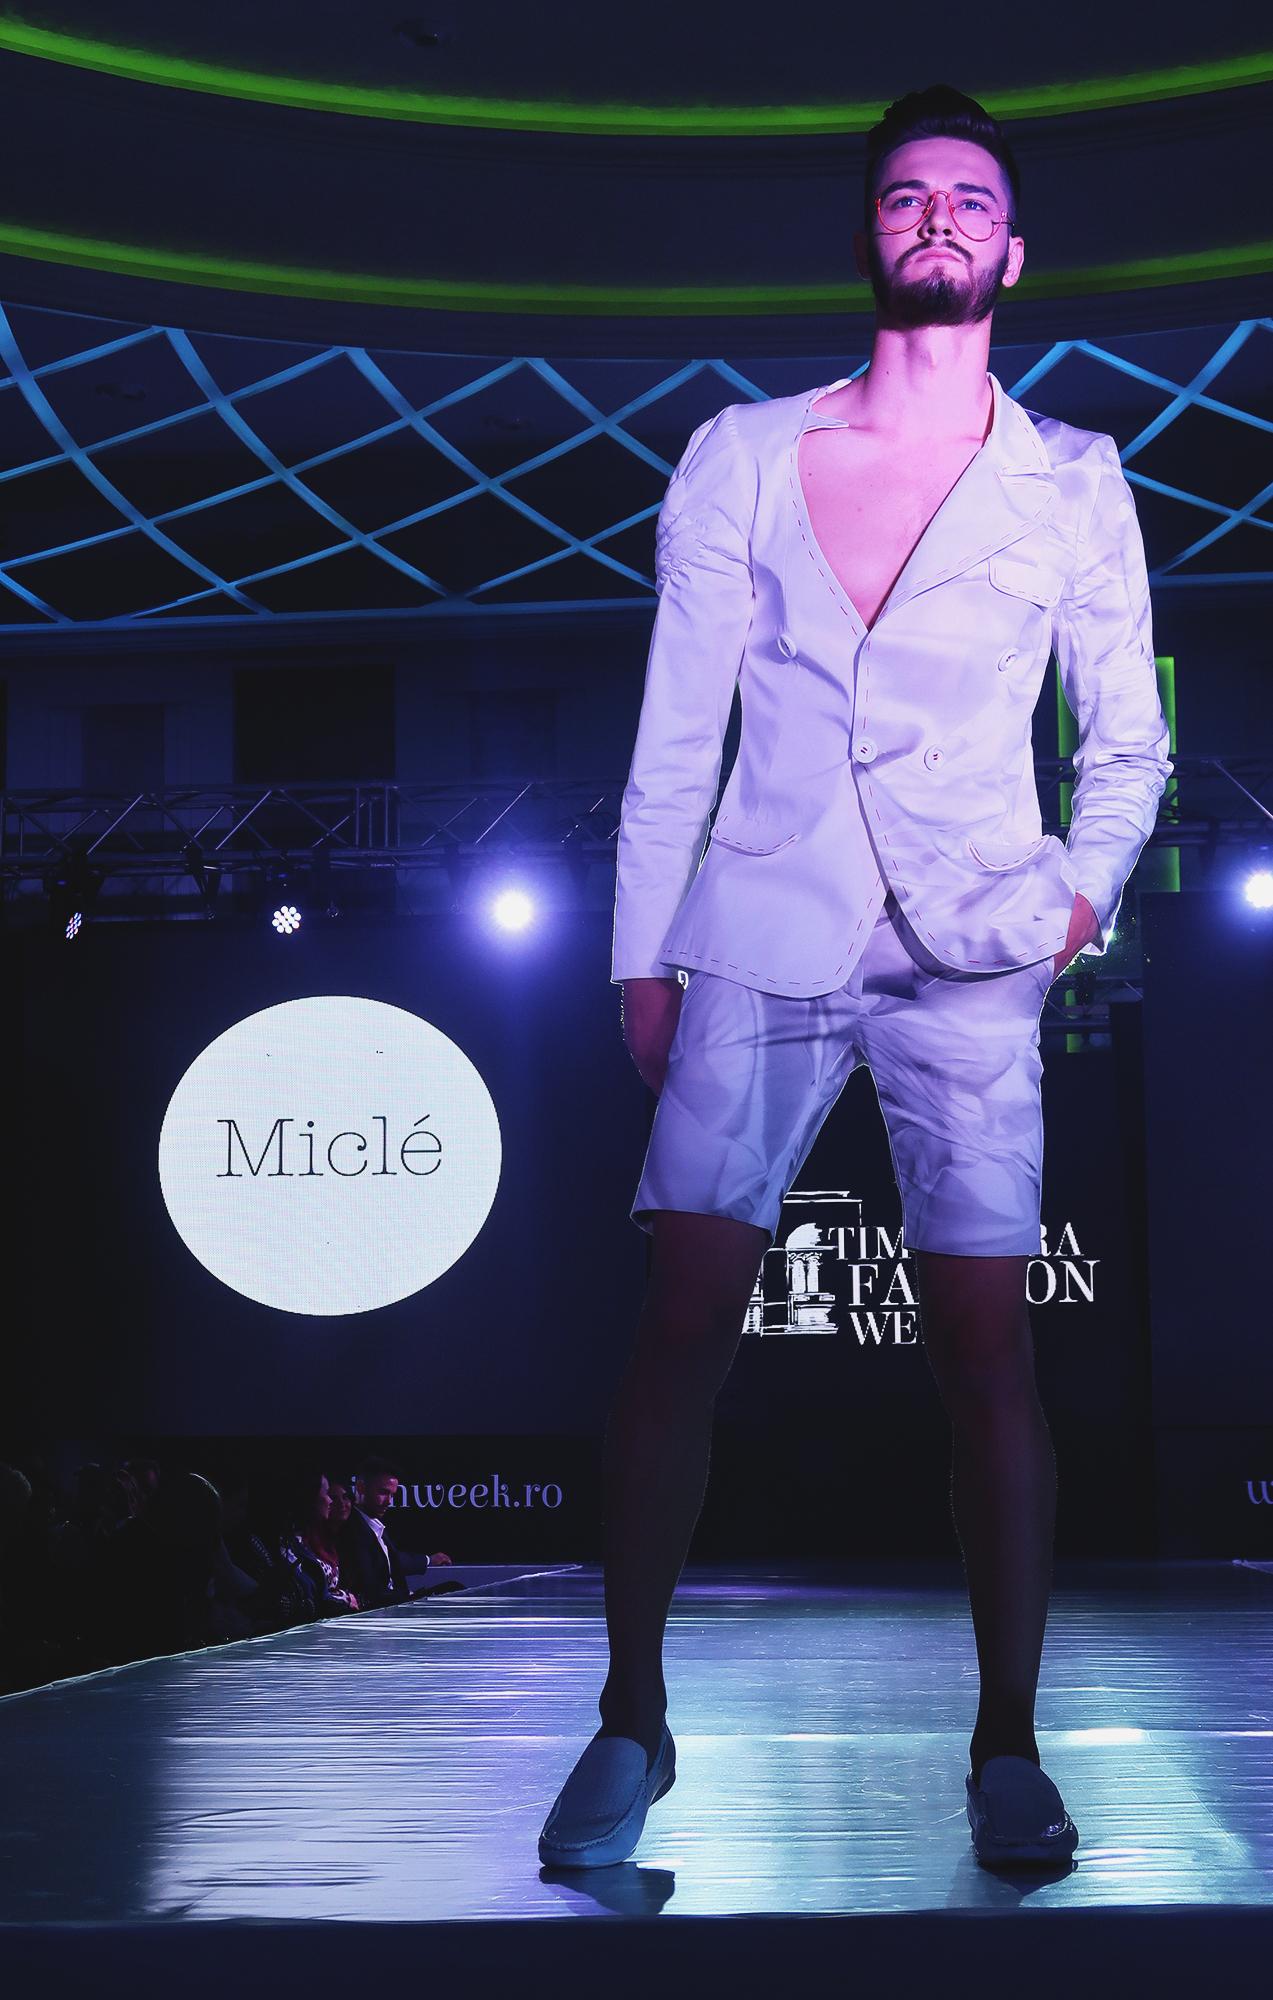 micle (2)